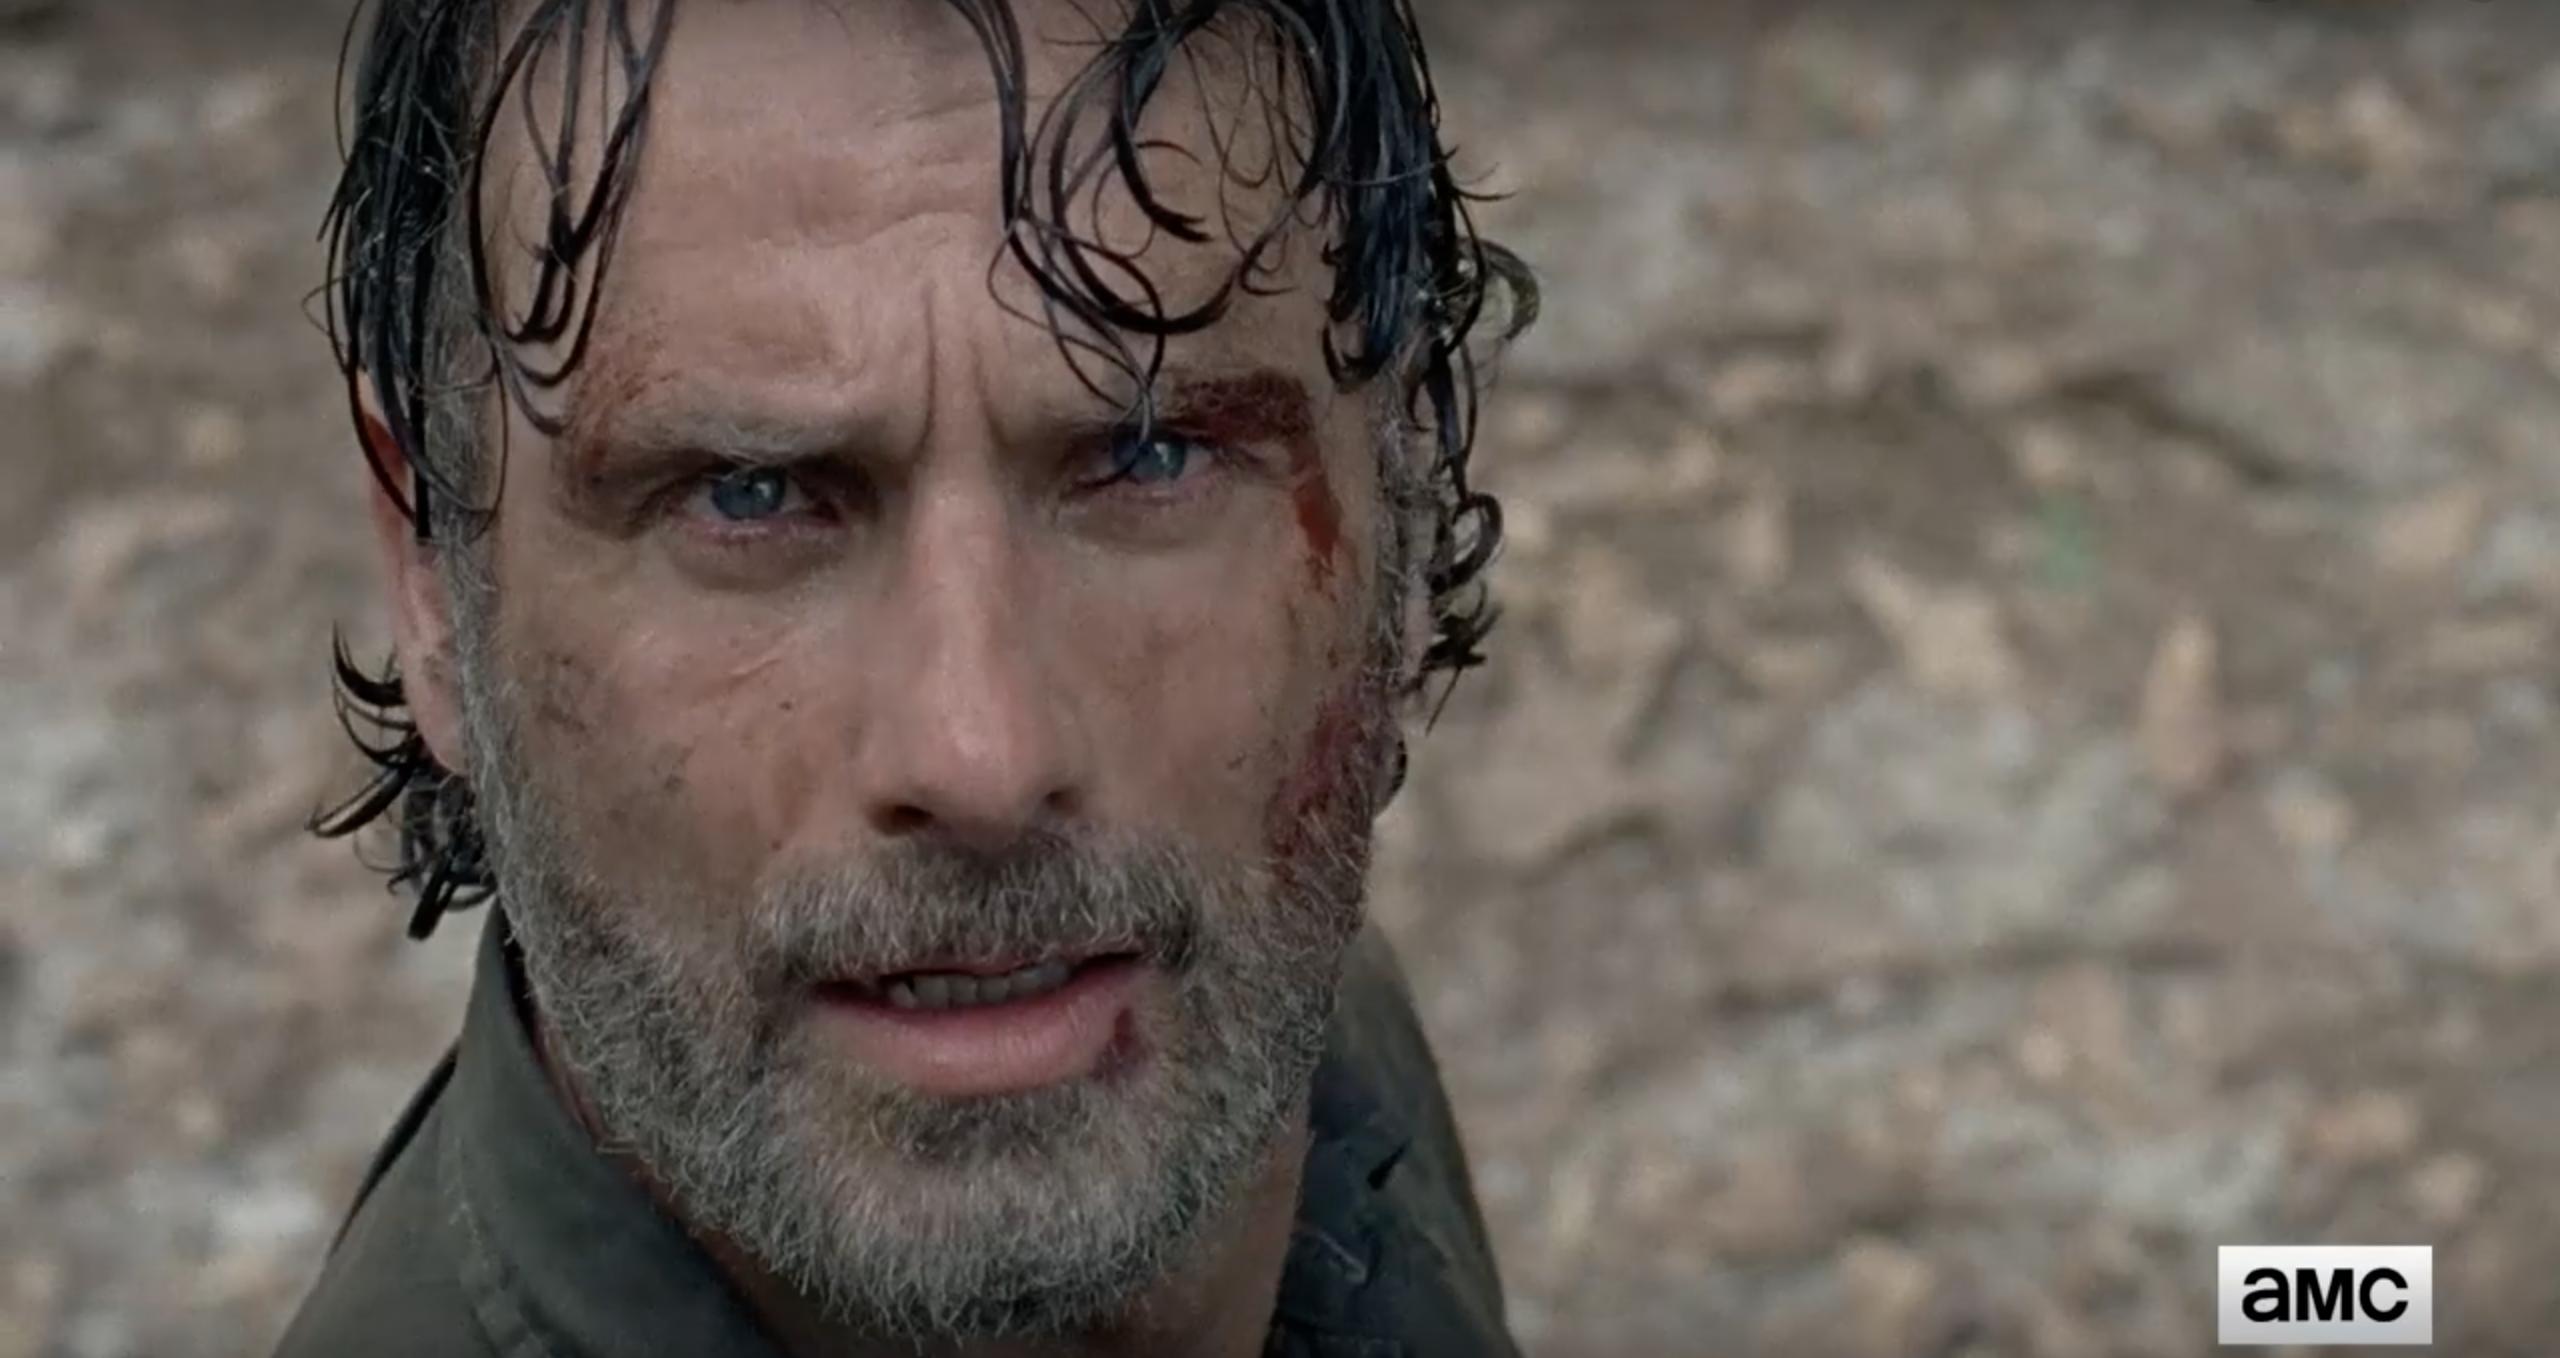 'The Walking Dead' Season 8 Trailer Debuts at Comic-Con